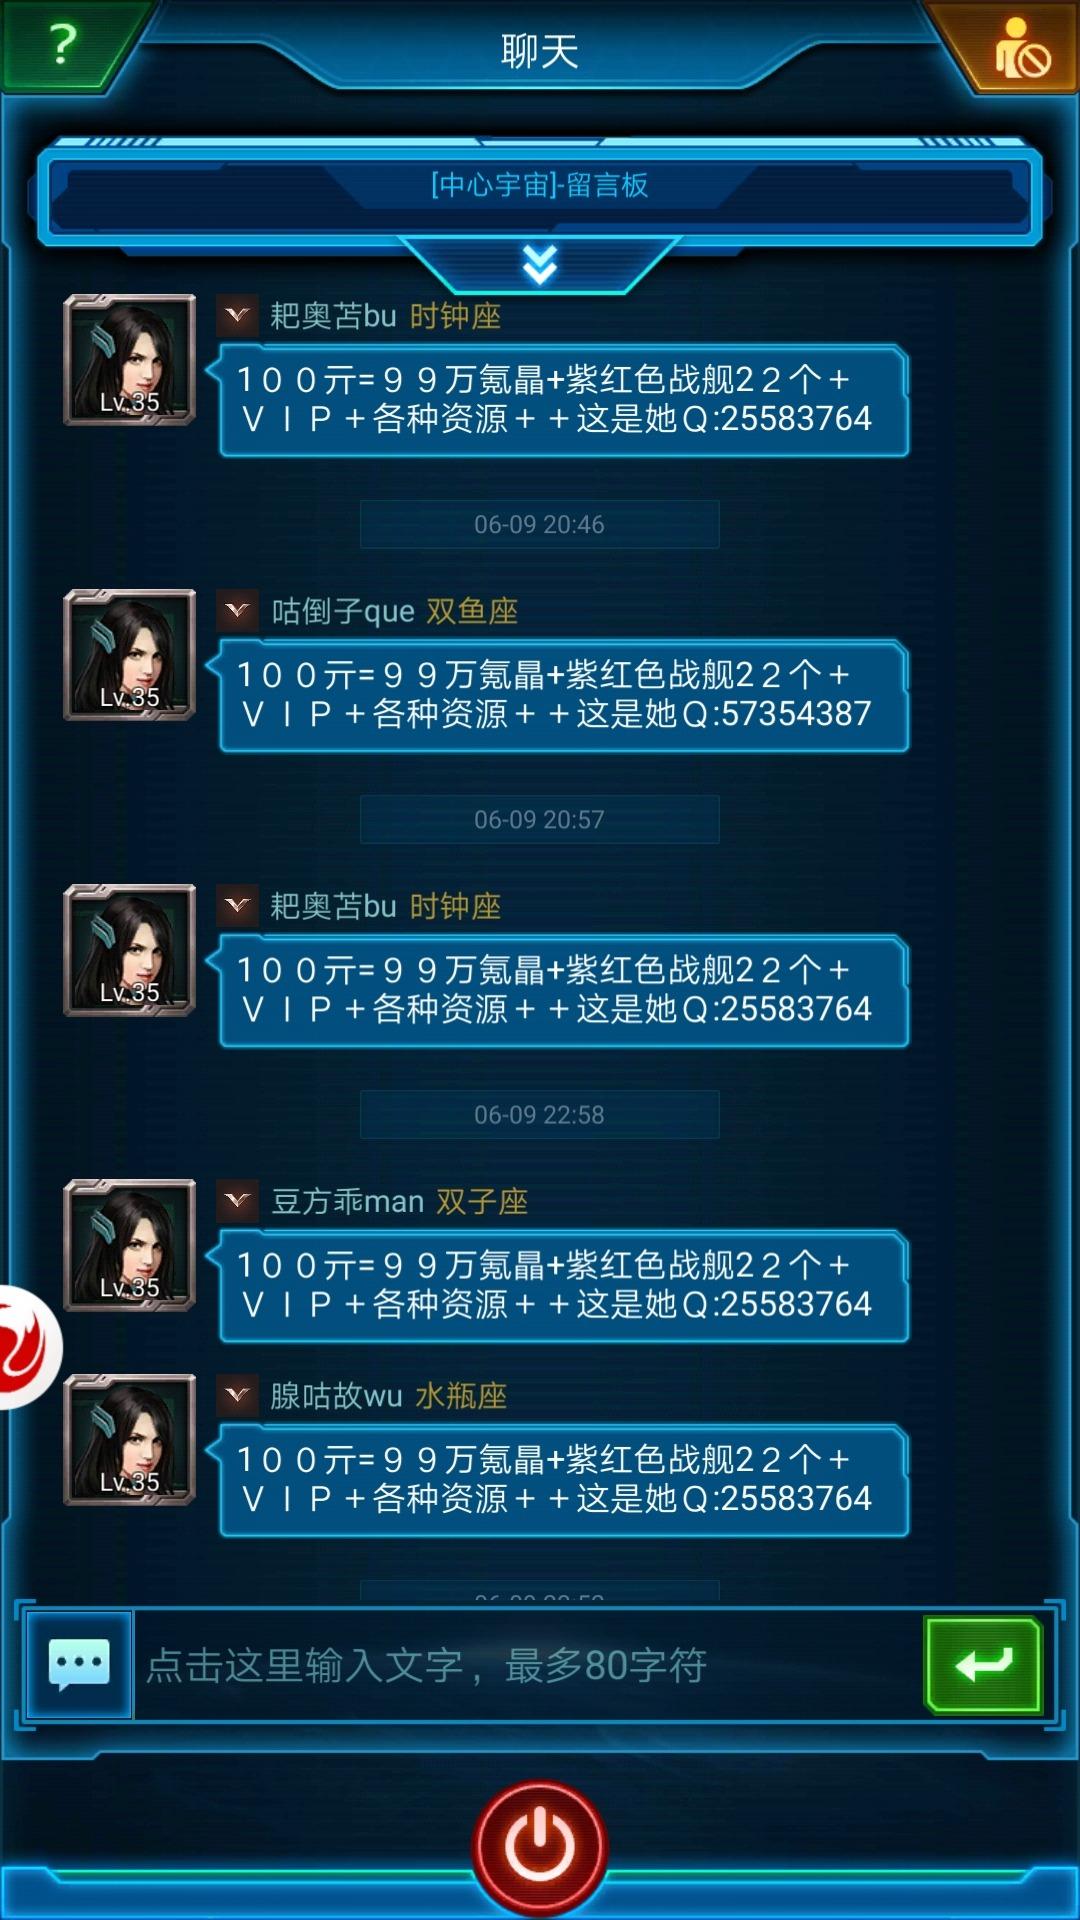 Screenshot_20190610_154554_com.jedigames.p16s.luobo.jpg